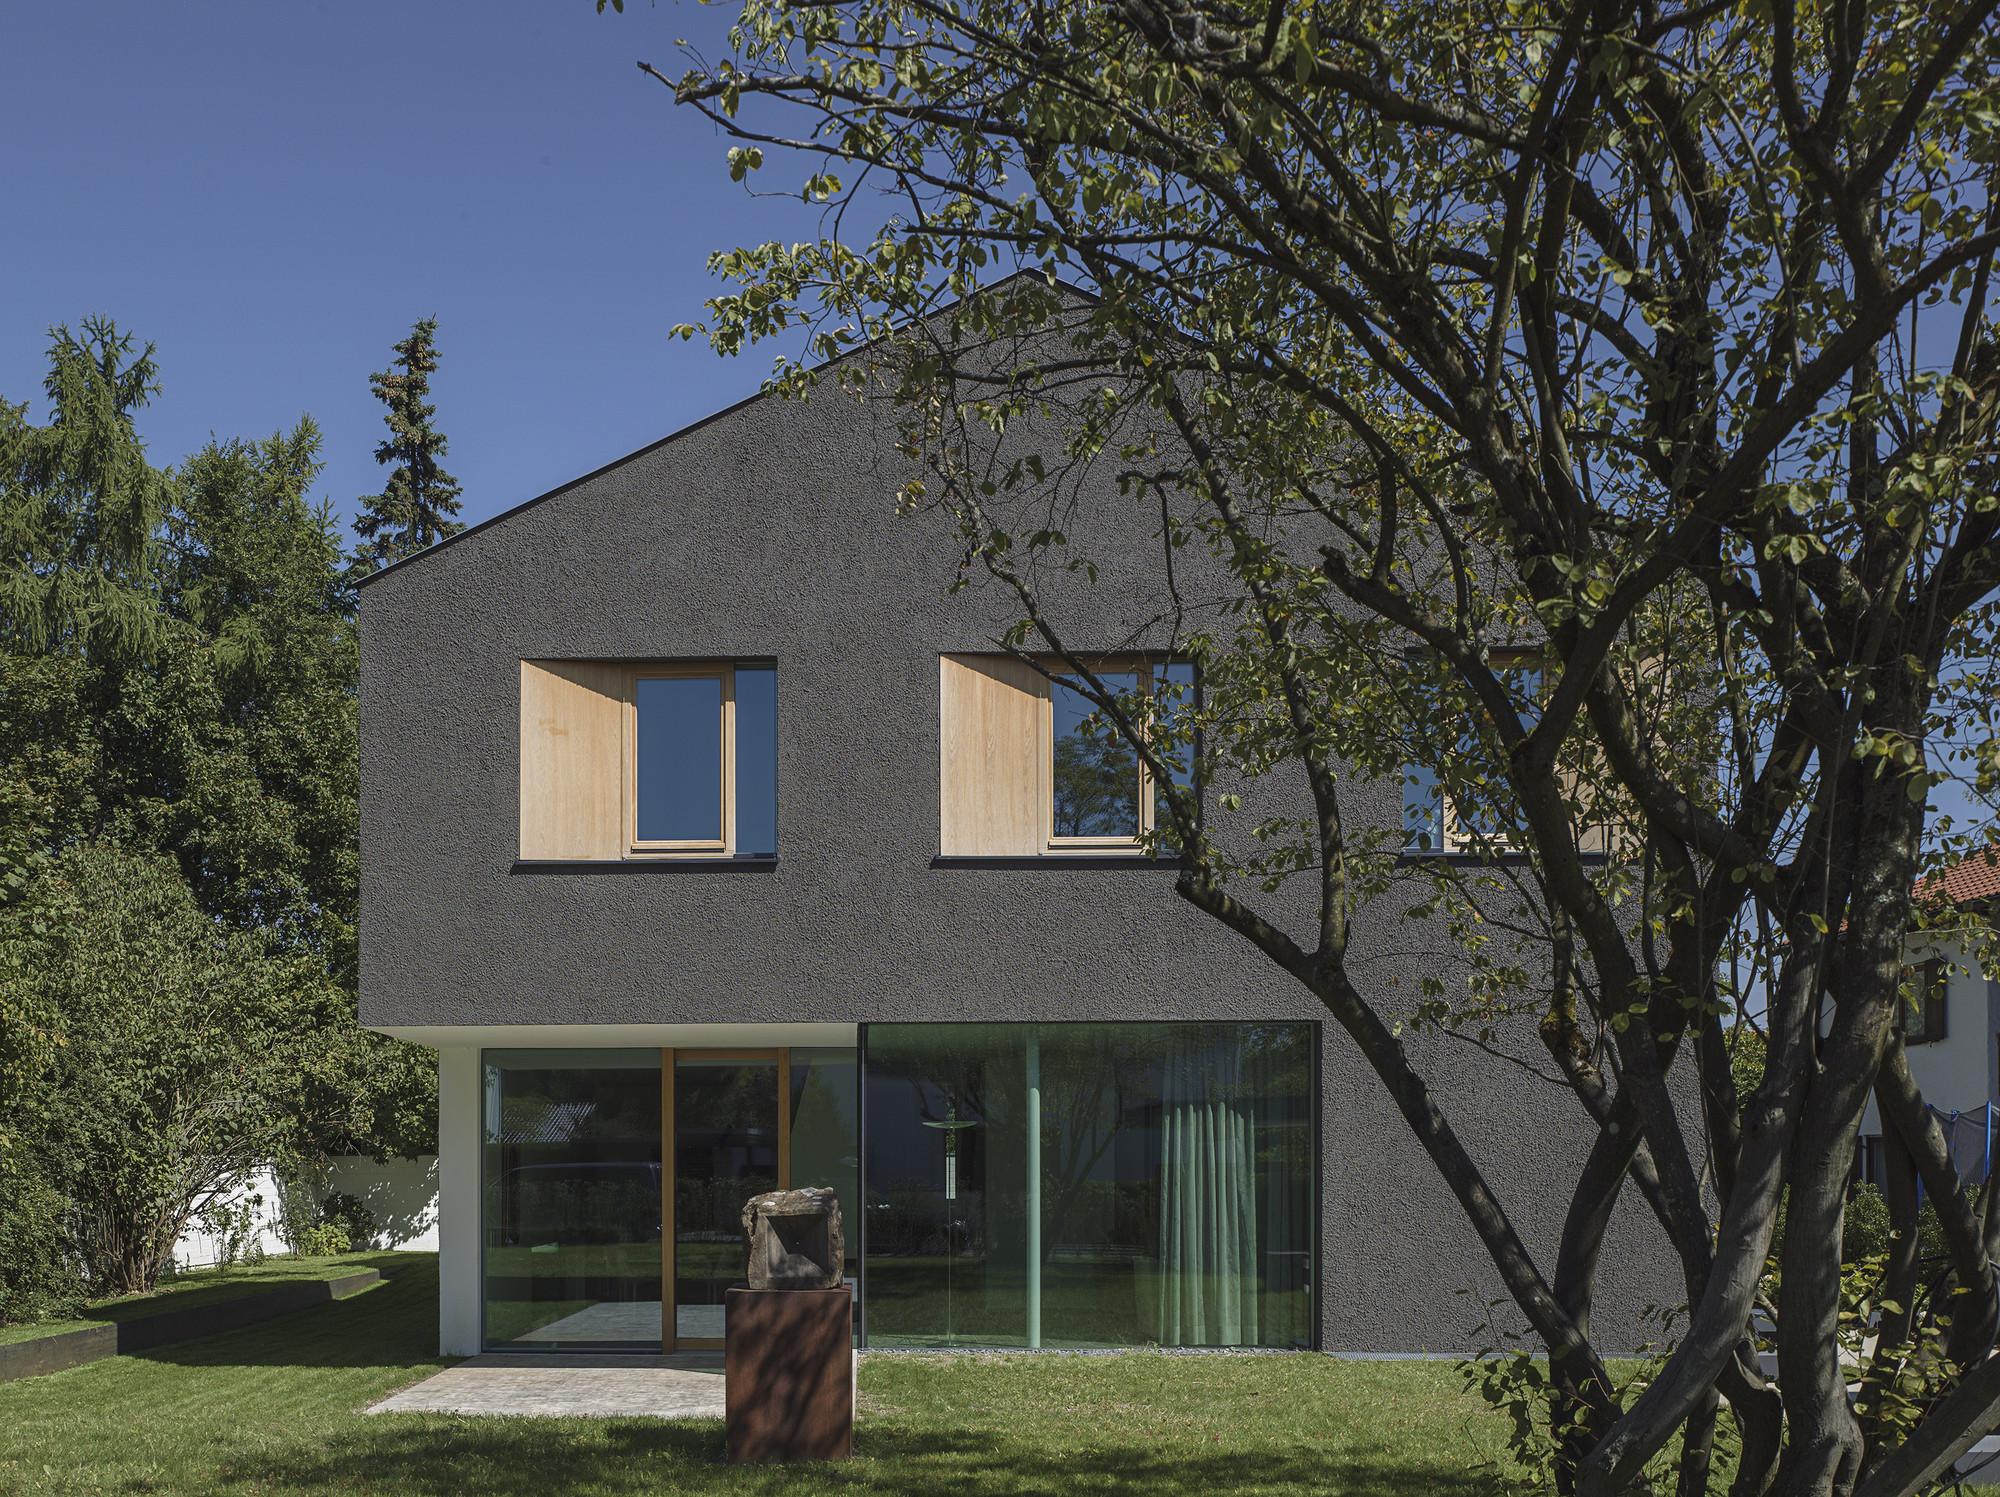 House Krailling / Unterlandstättner Architekten, Courtesy of Unterlandstättner Architekten